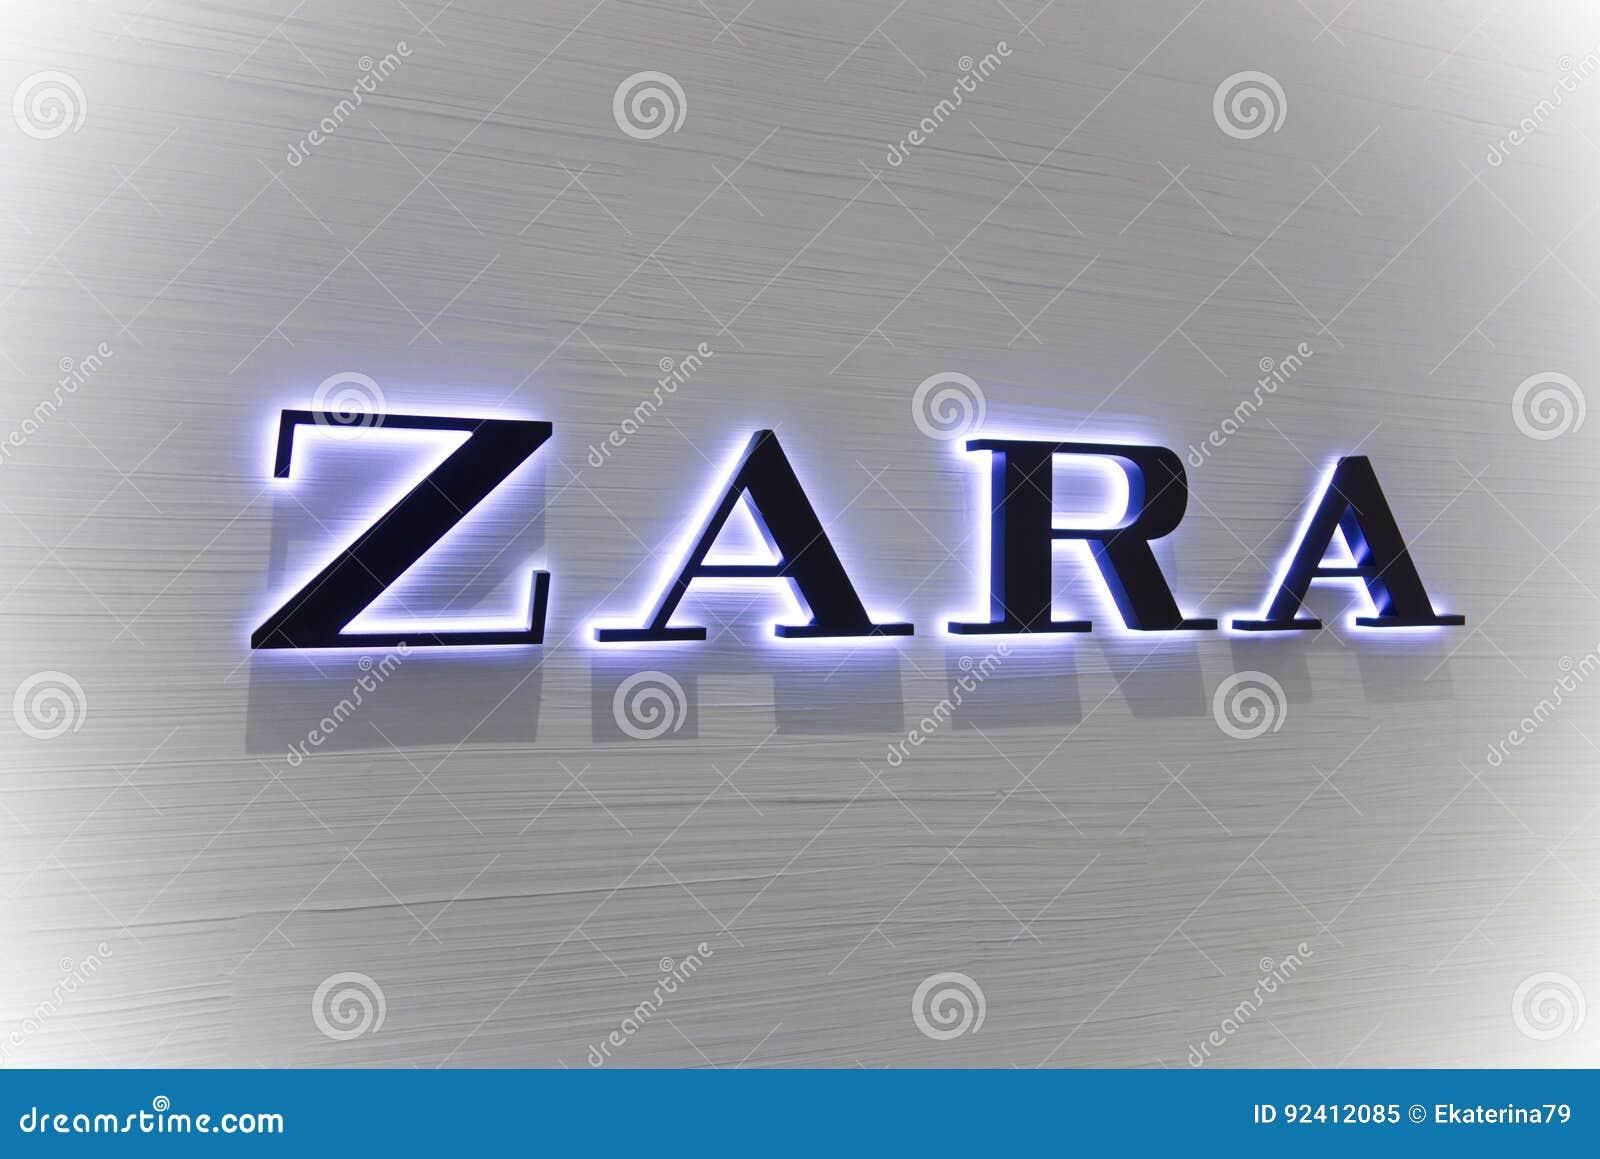 Logo Zara On White Wall Editorial Image Image Of Cyprus 92412085